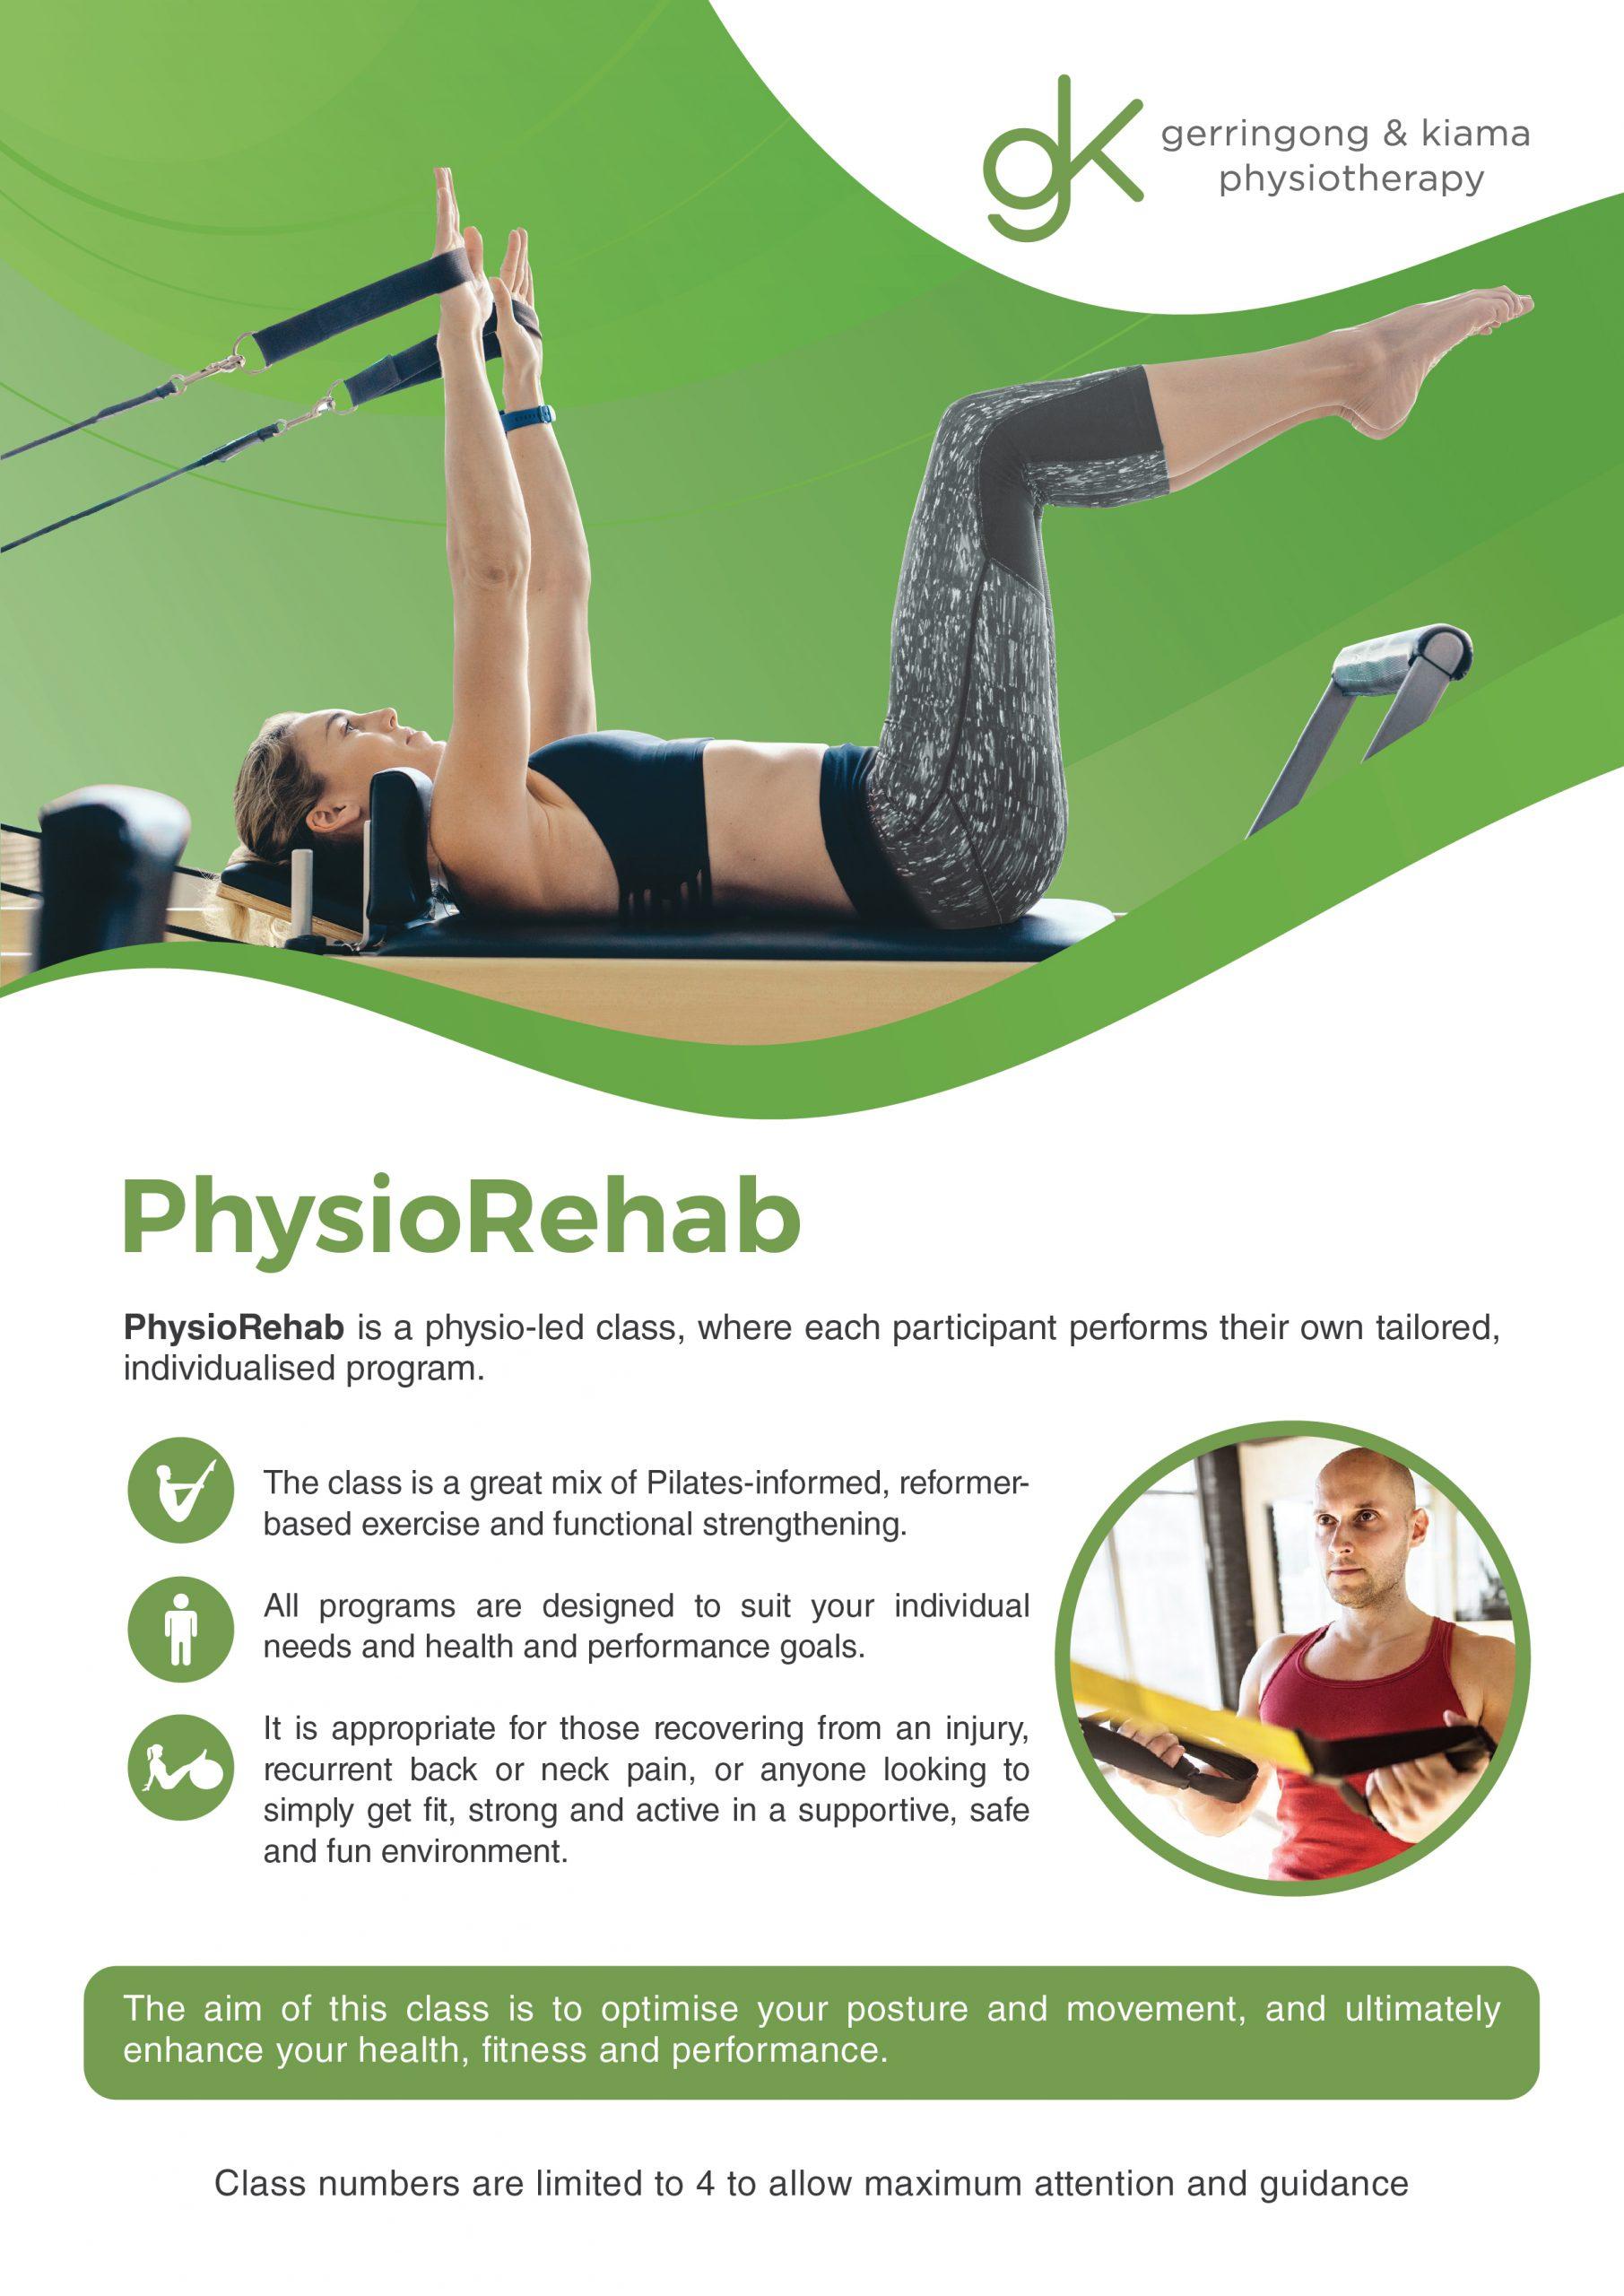 Image of PhysioRehab brochure